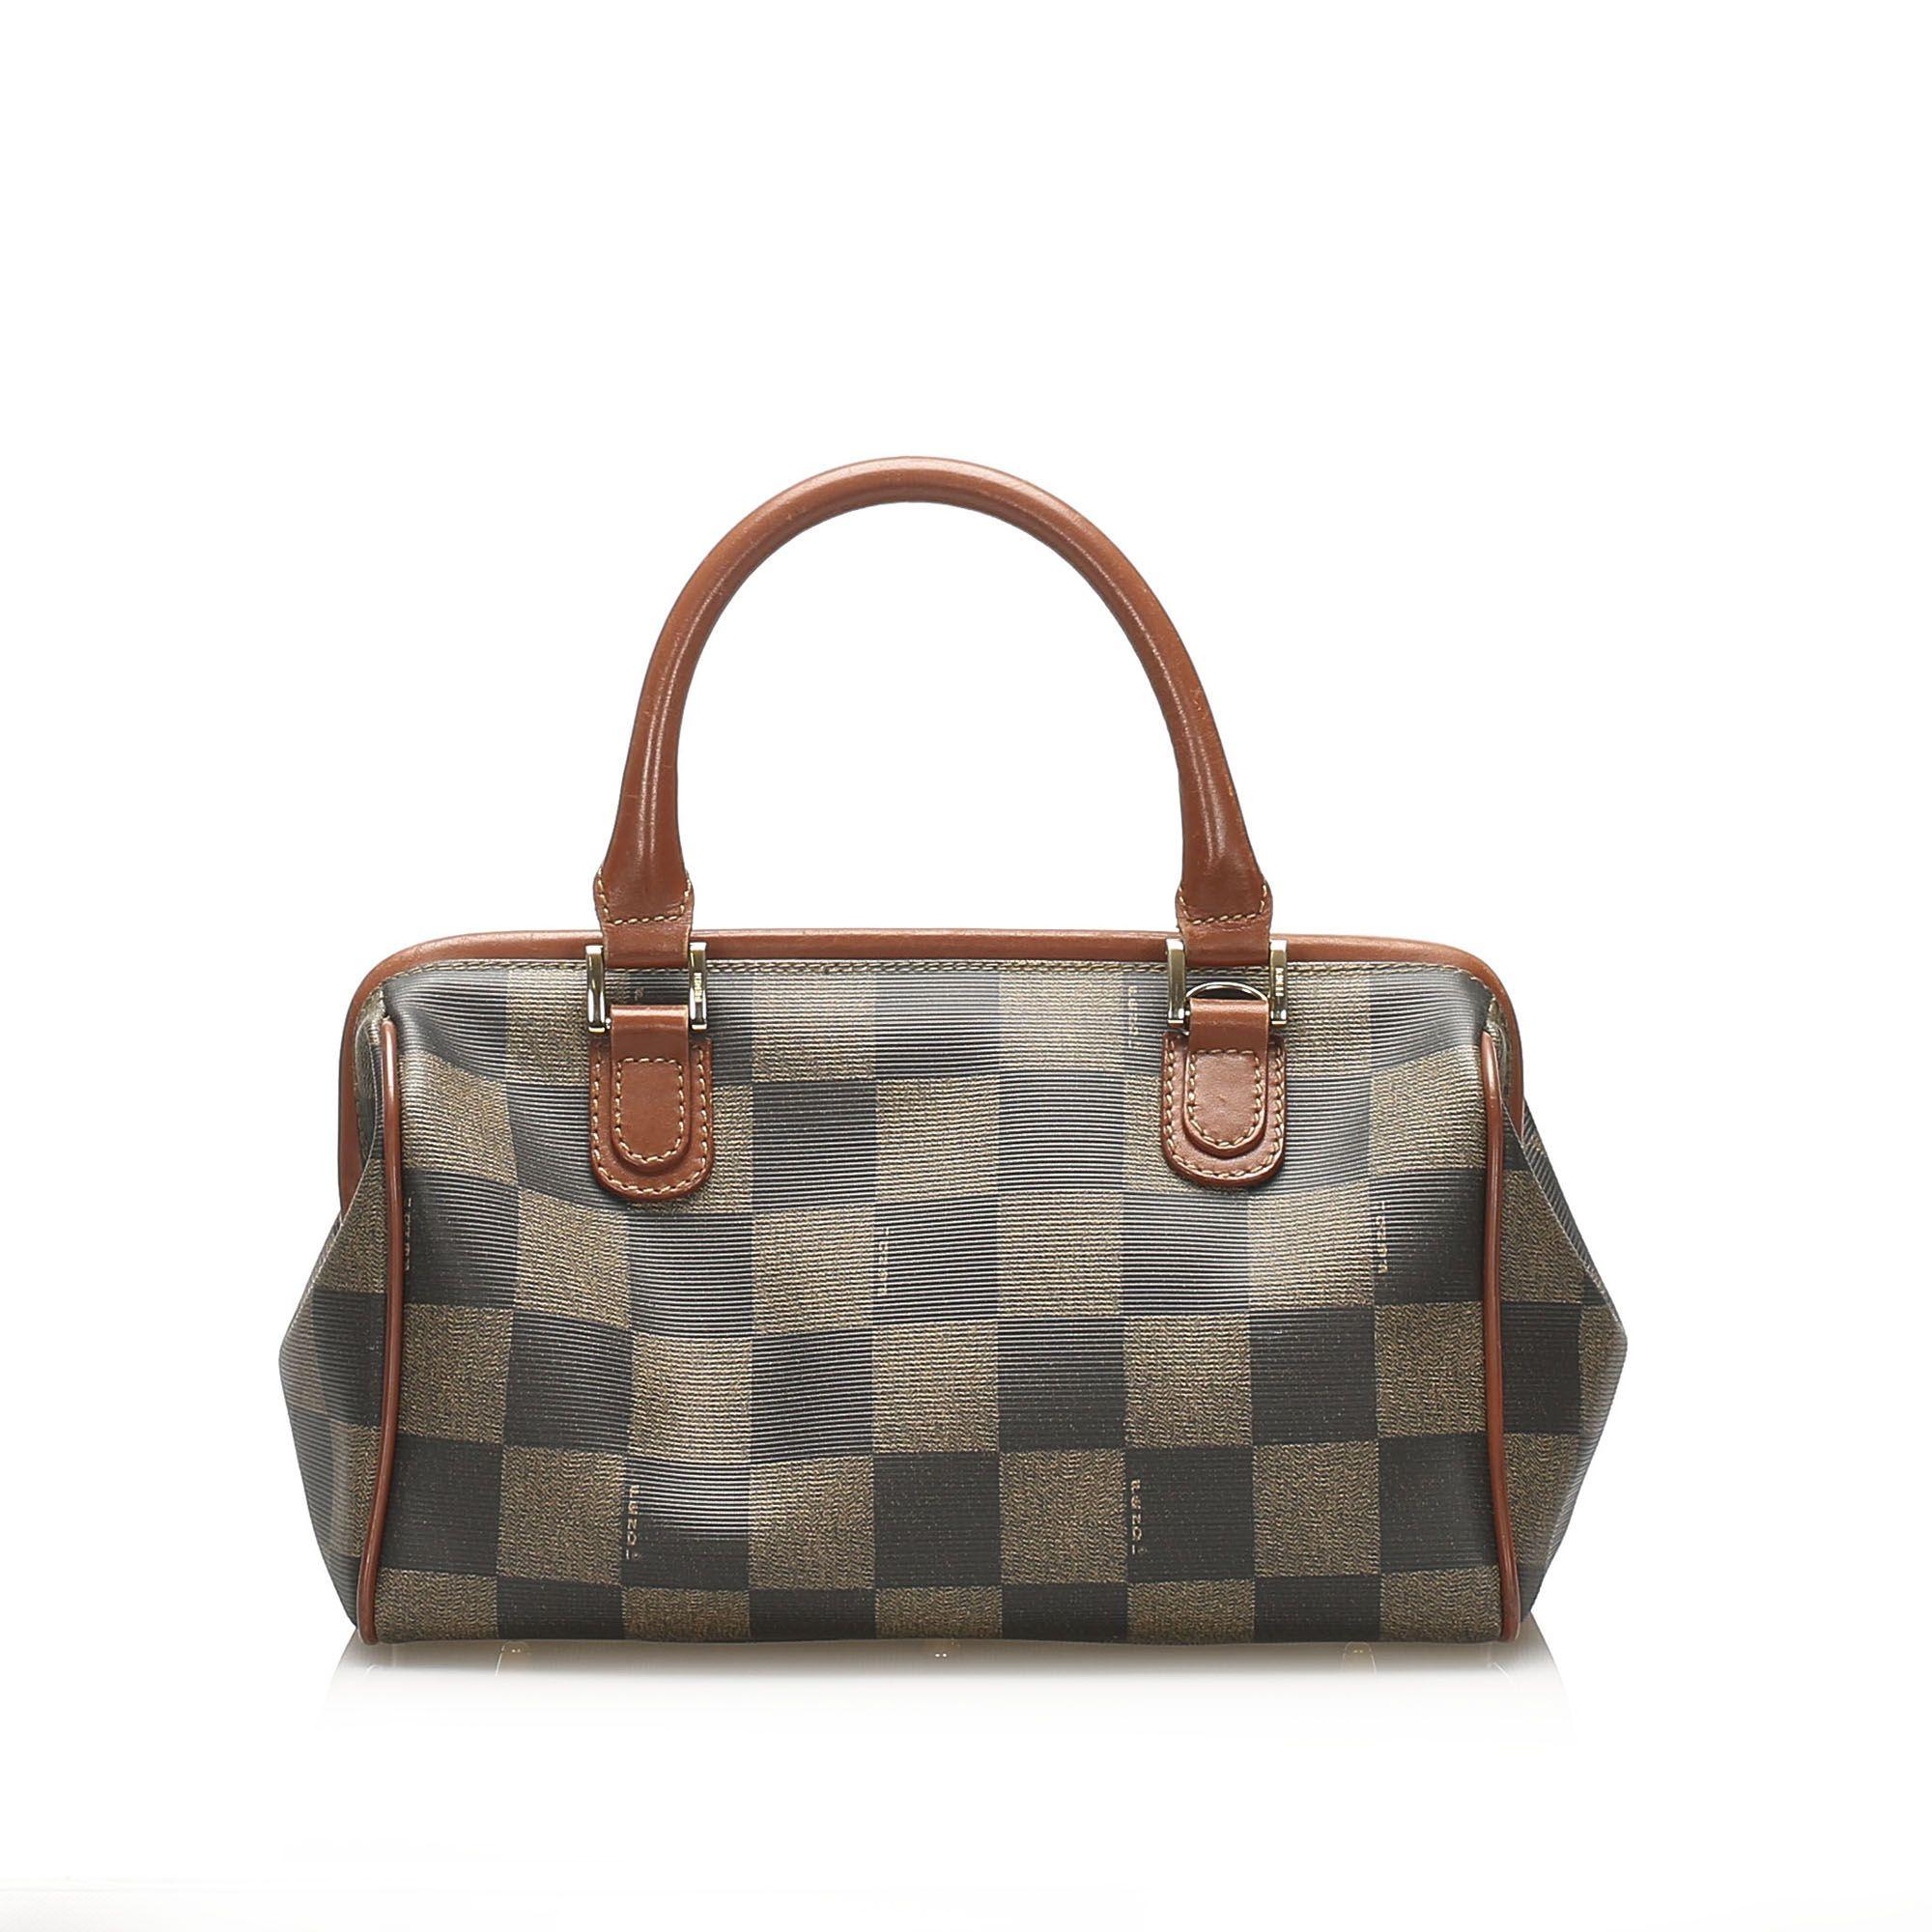 Vintage Fendi Pequin Boston Bag Brown